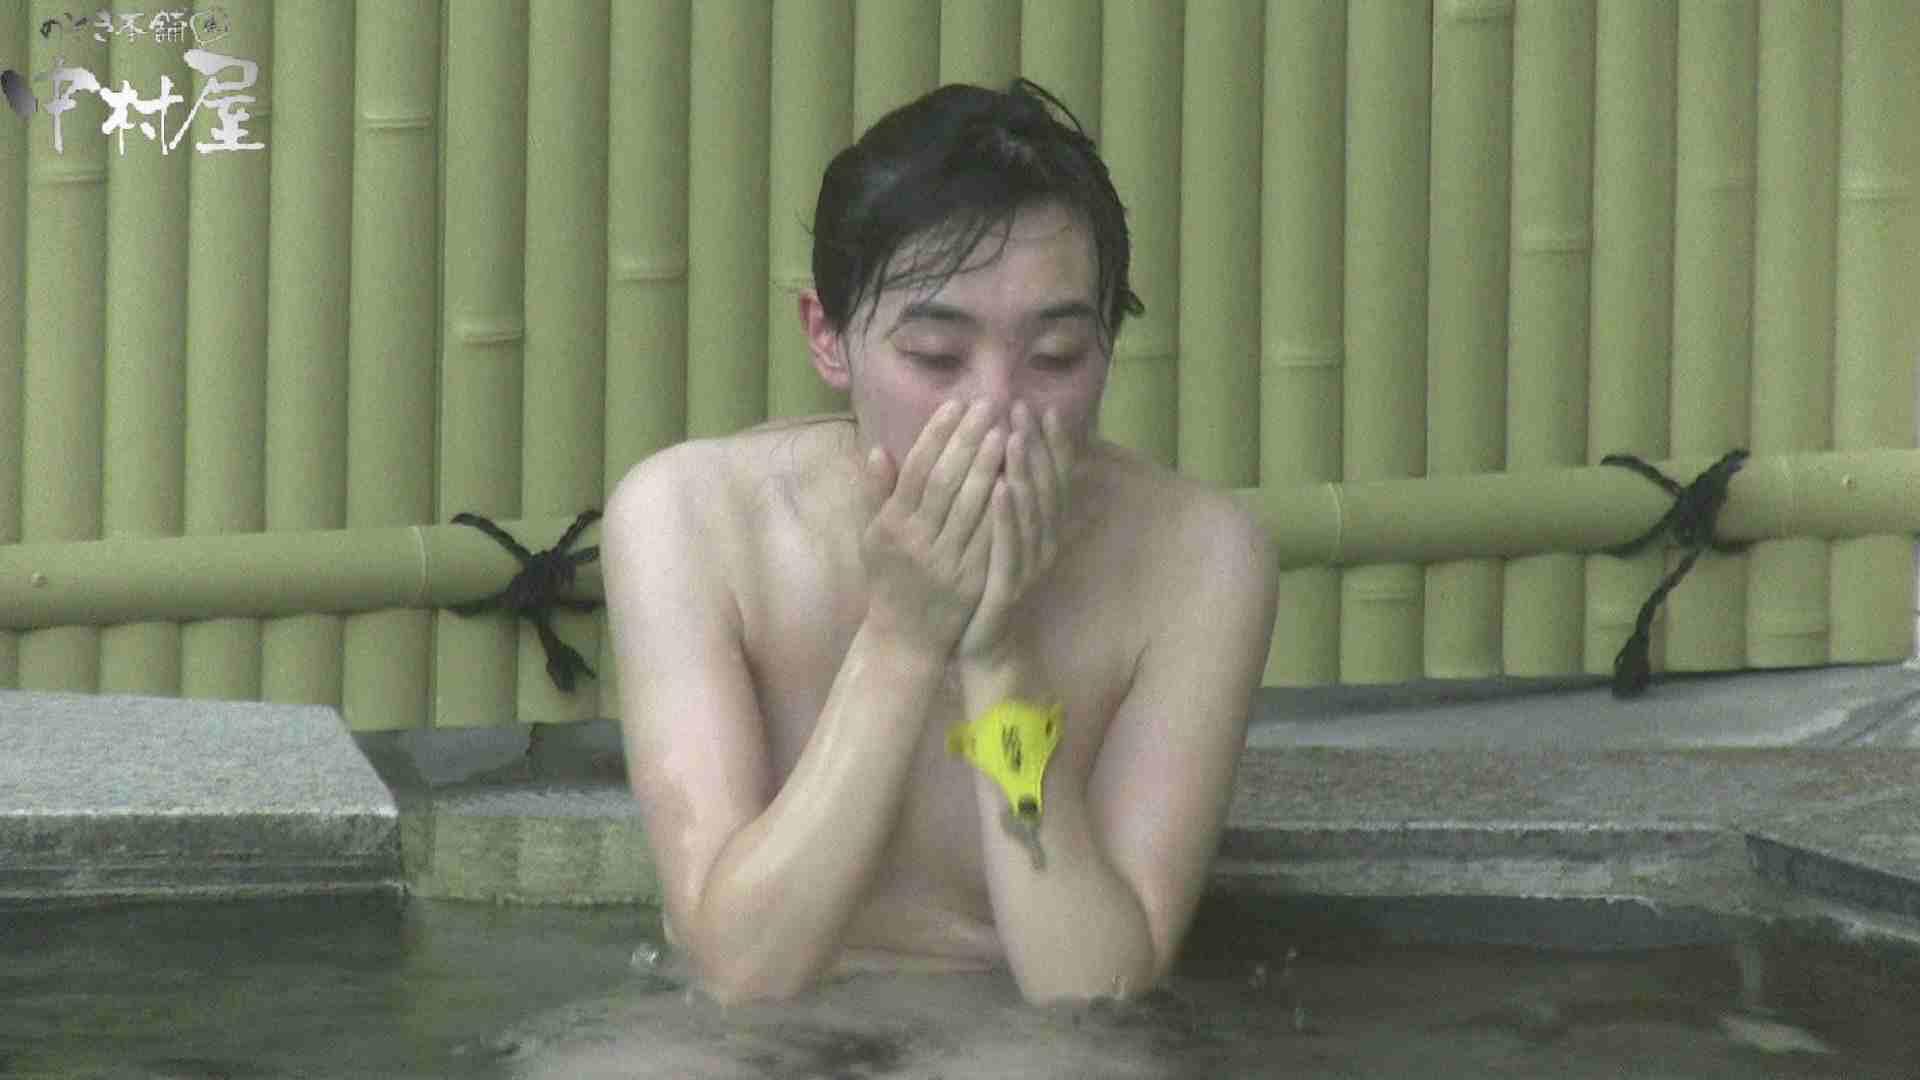 Aquaな露天風呂Vol.910 盗撮シリーズ | 露天風呂編  84PIX 83